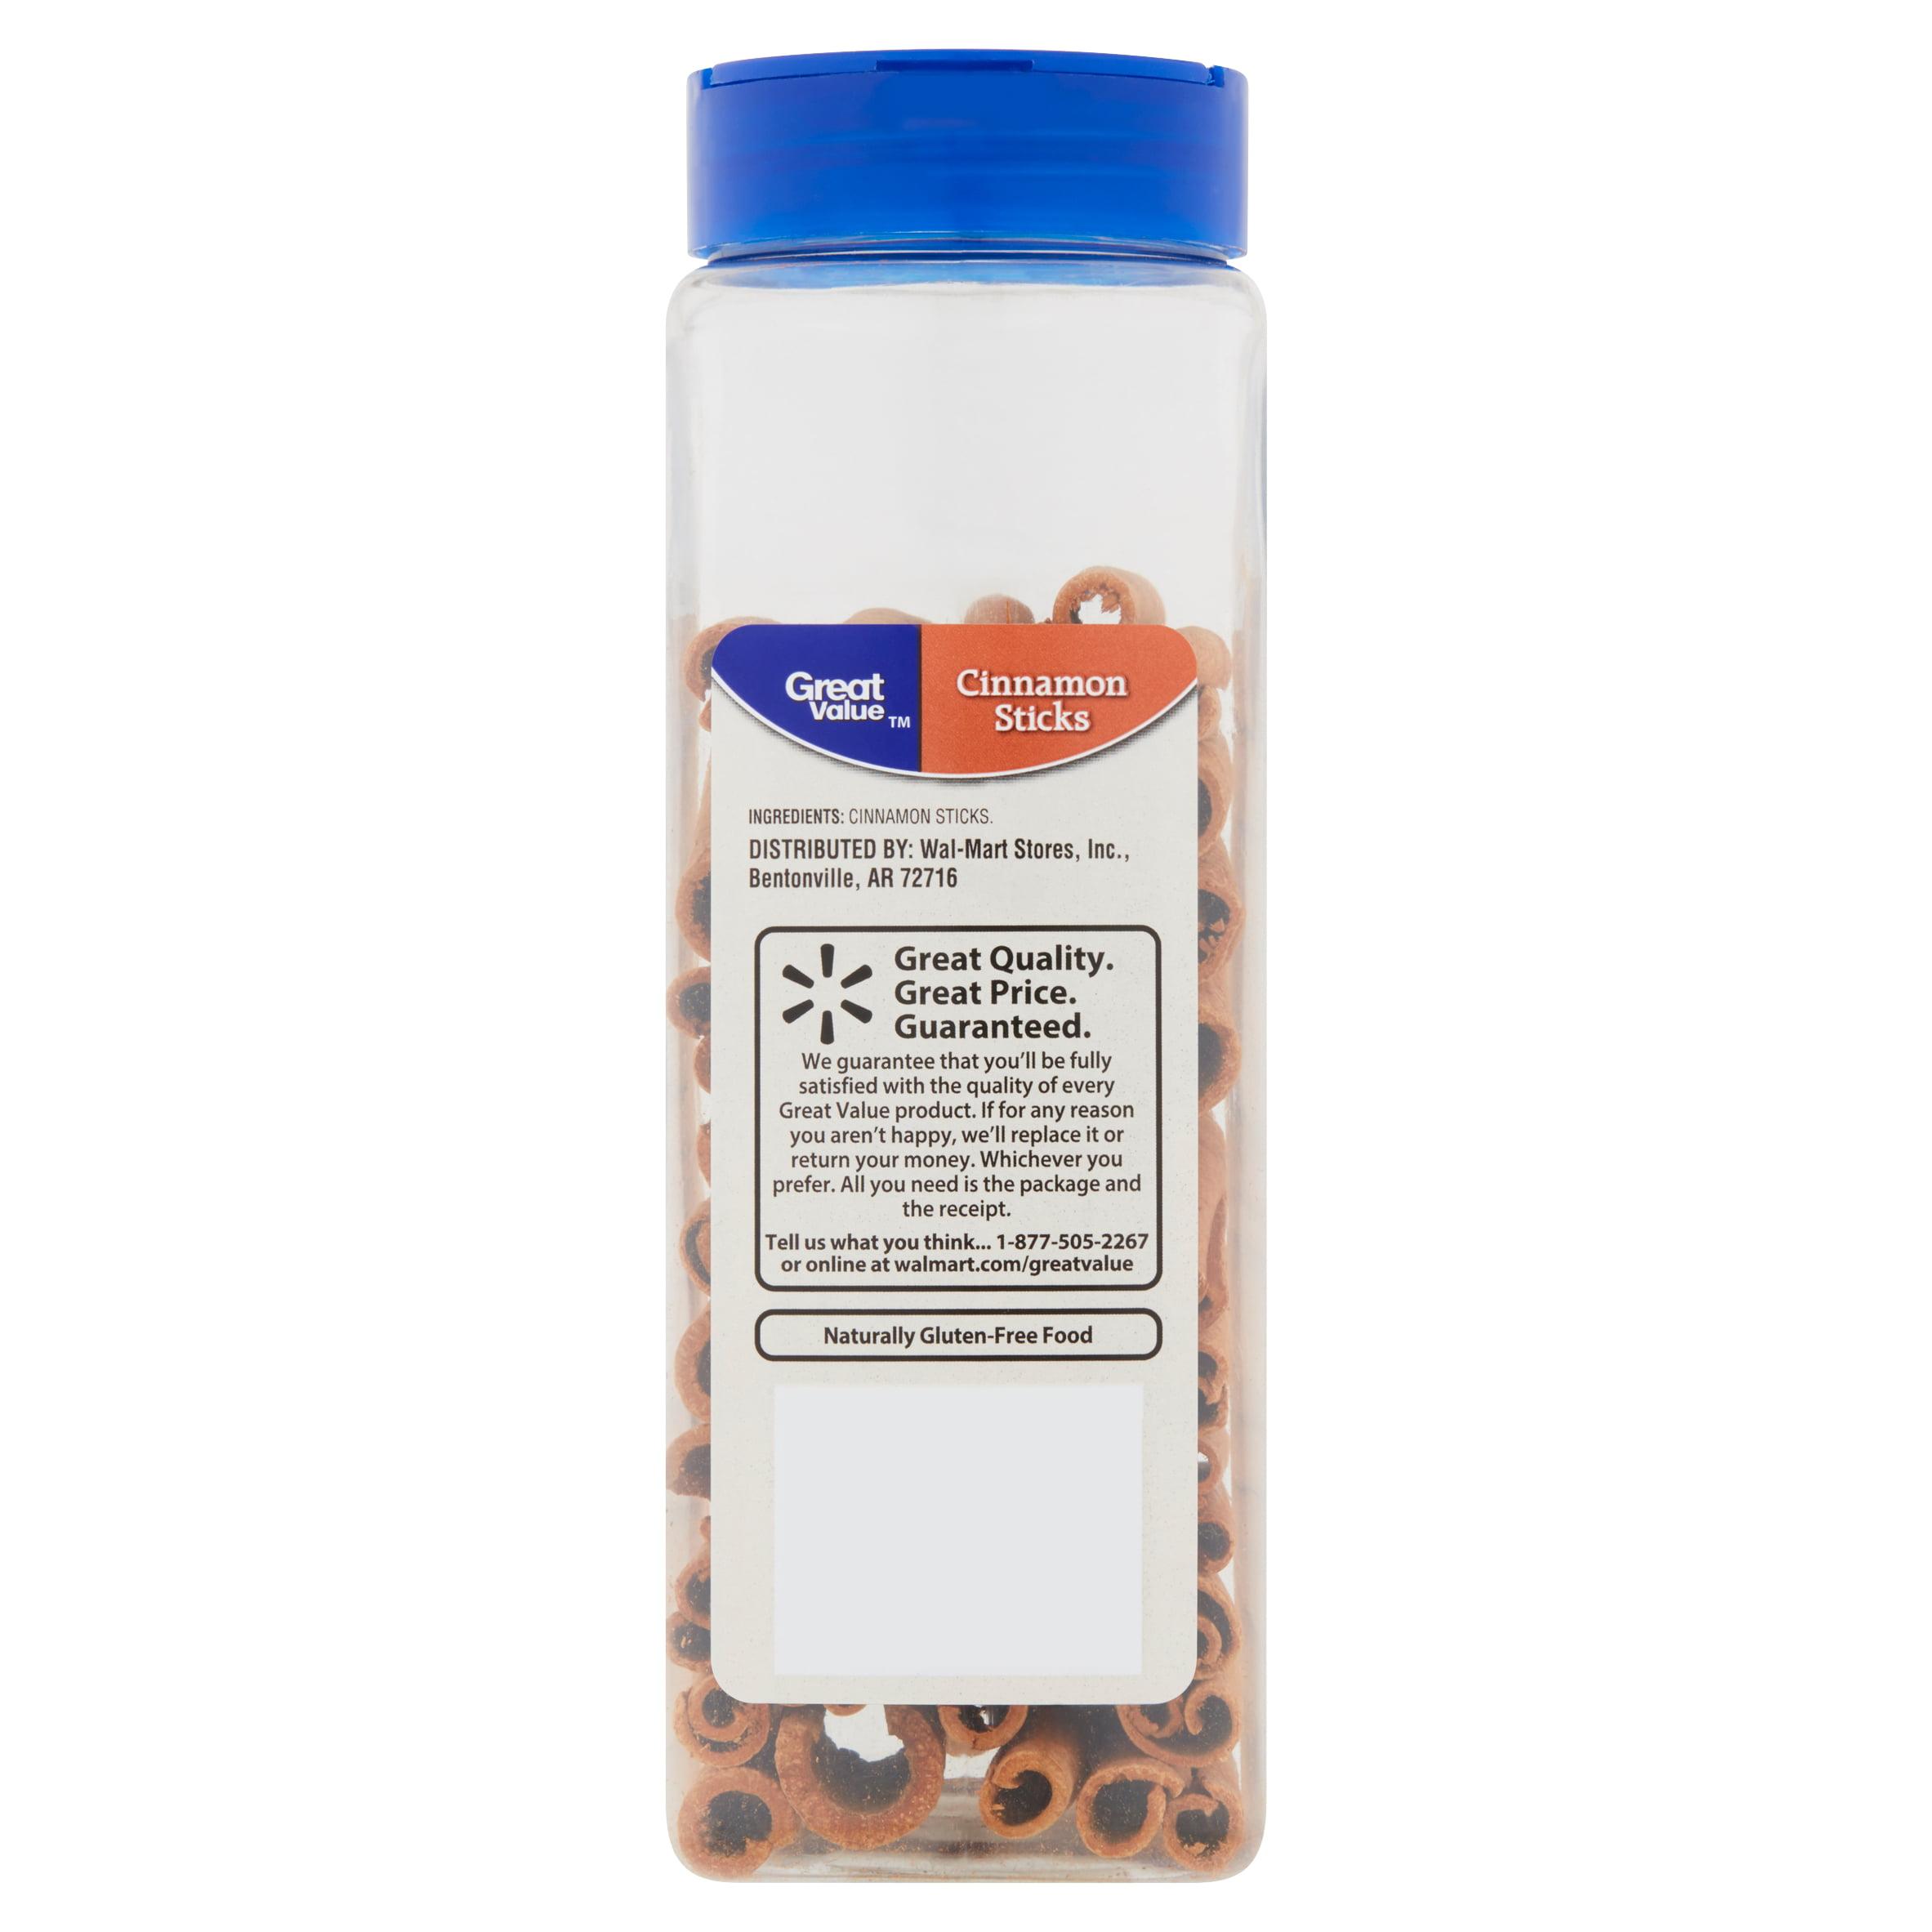 Great Value Cinnamon Sticks, 9 oz - Walmart com